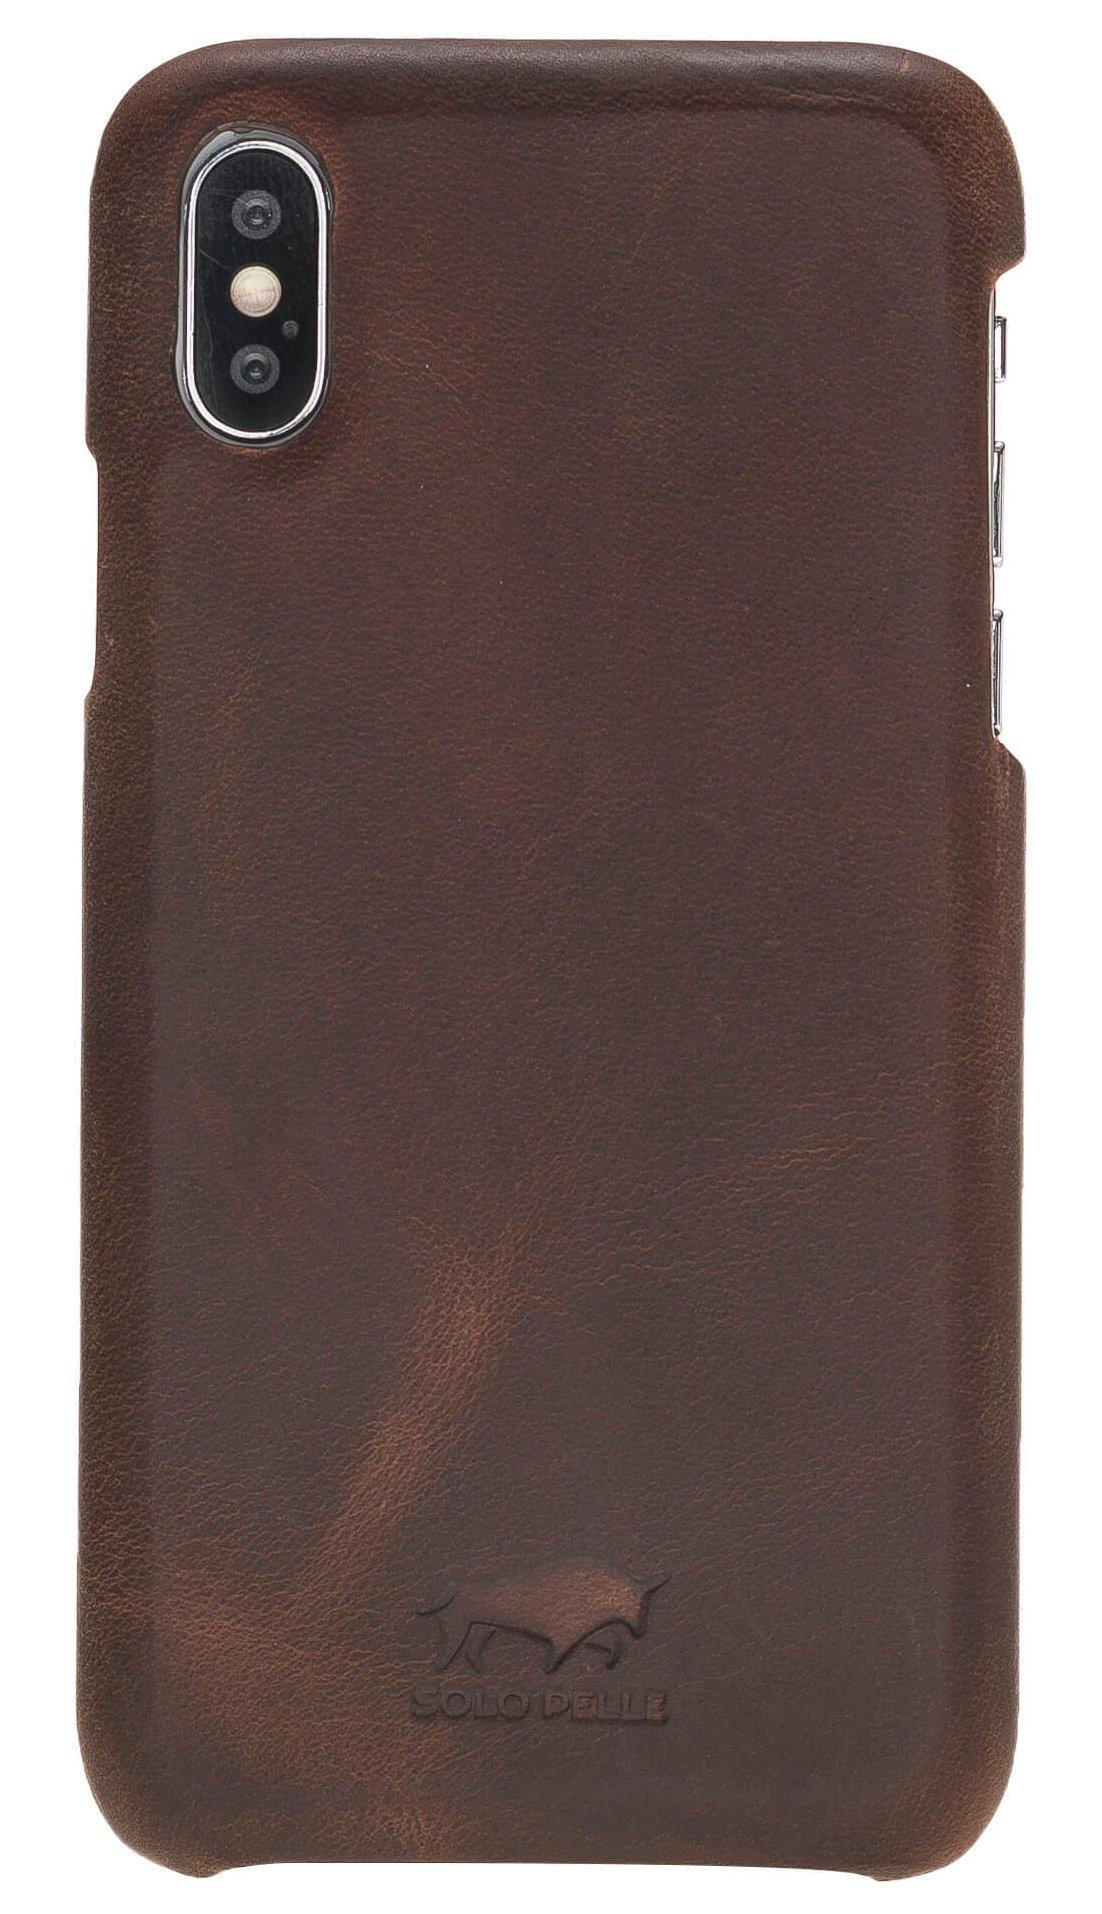 "Lederhülle für das iPhone XS/X Backcover - ""Princeton"" - in Vintage Braun"